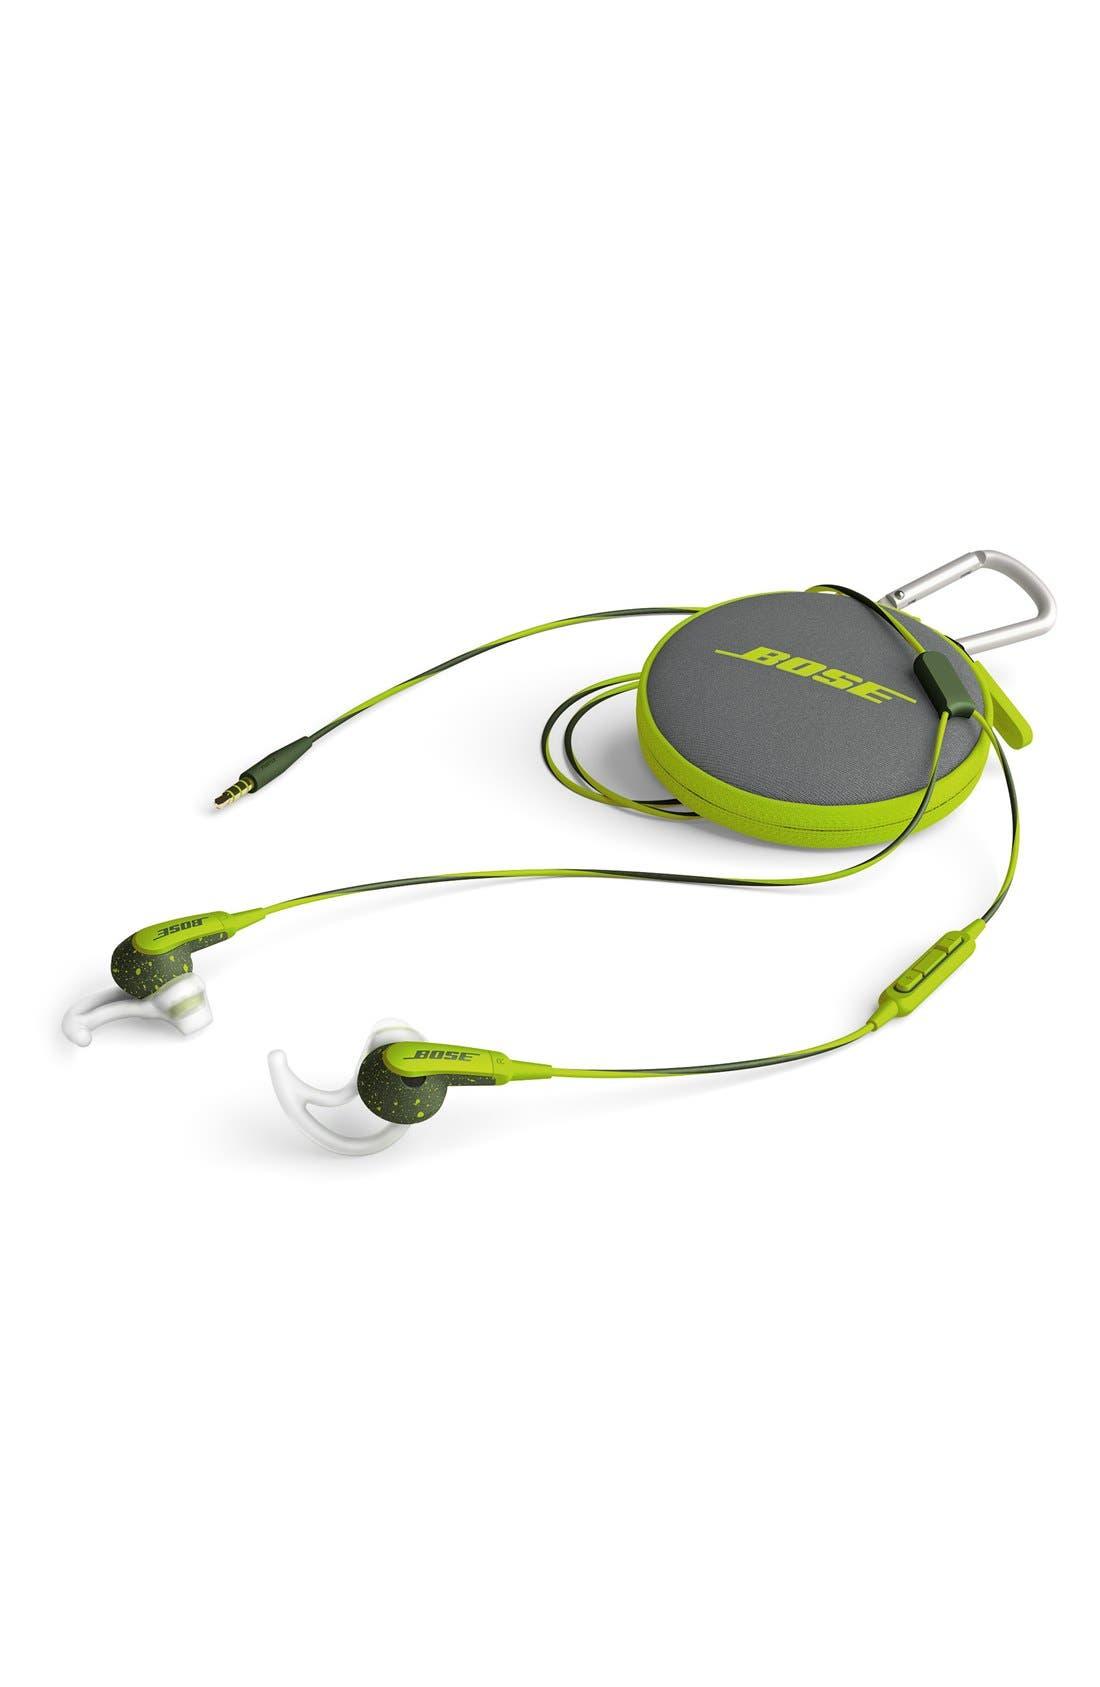 SoundSport<sup>®</sup> In-Ear Headphones,                             Alternate thumbnail 5, color,                             Energy Green